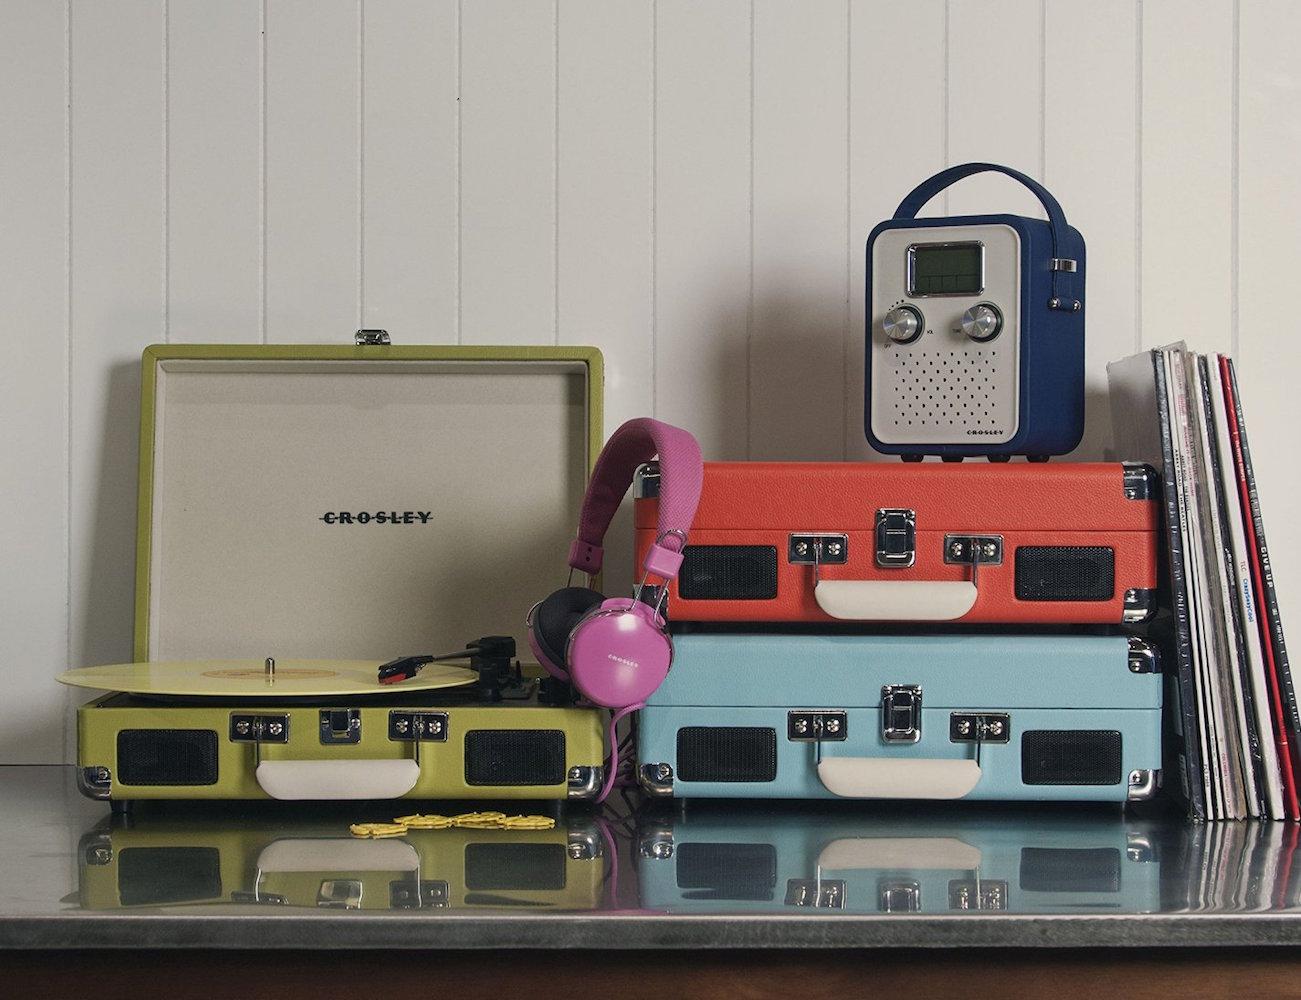 Crosley-Cruiser-Three-Speed-Portable-Turntable-02.jpg